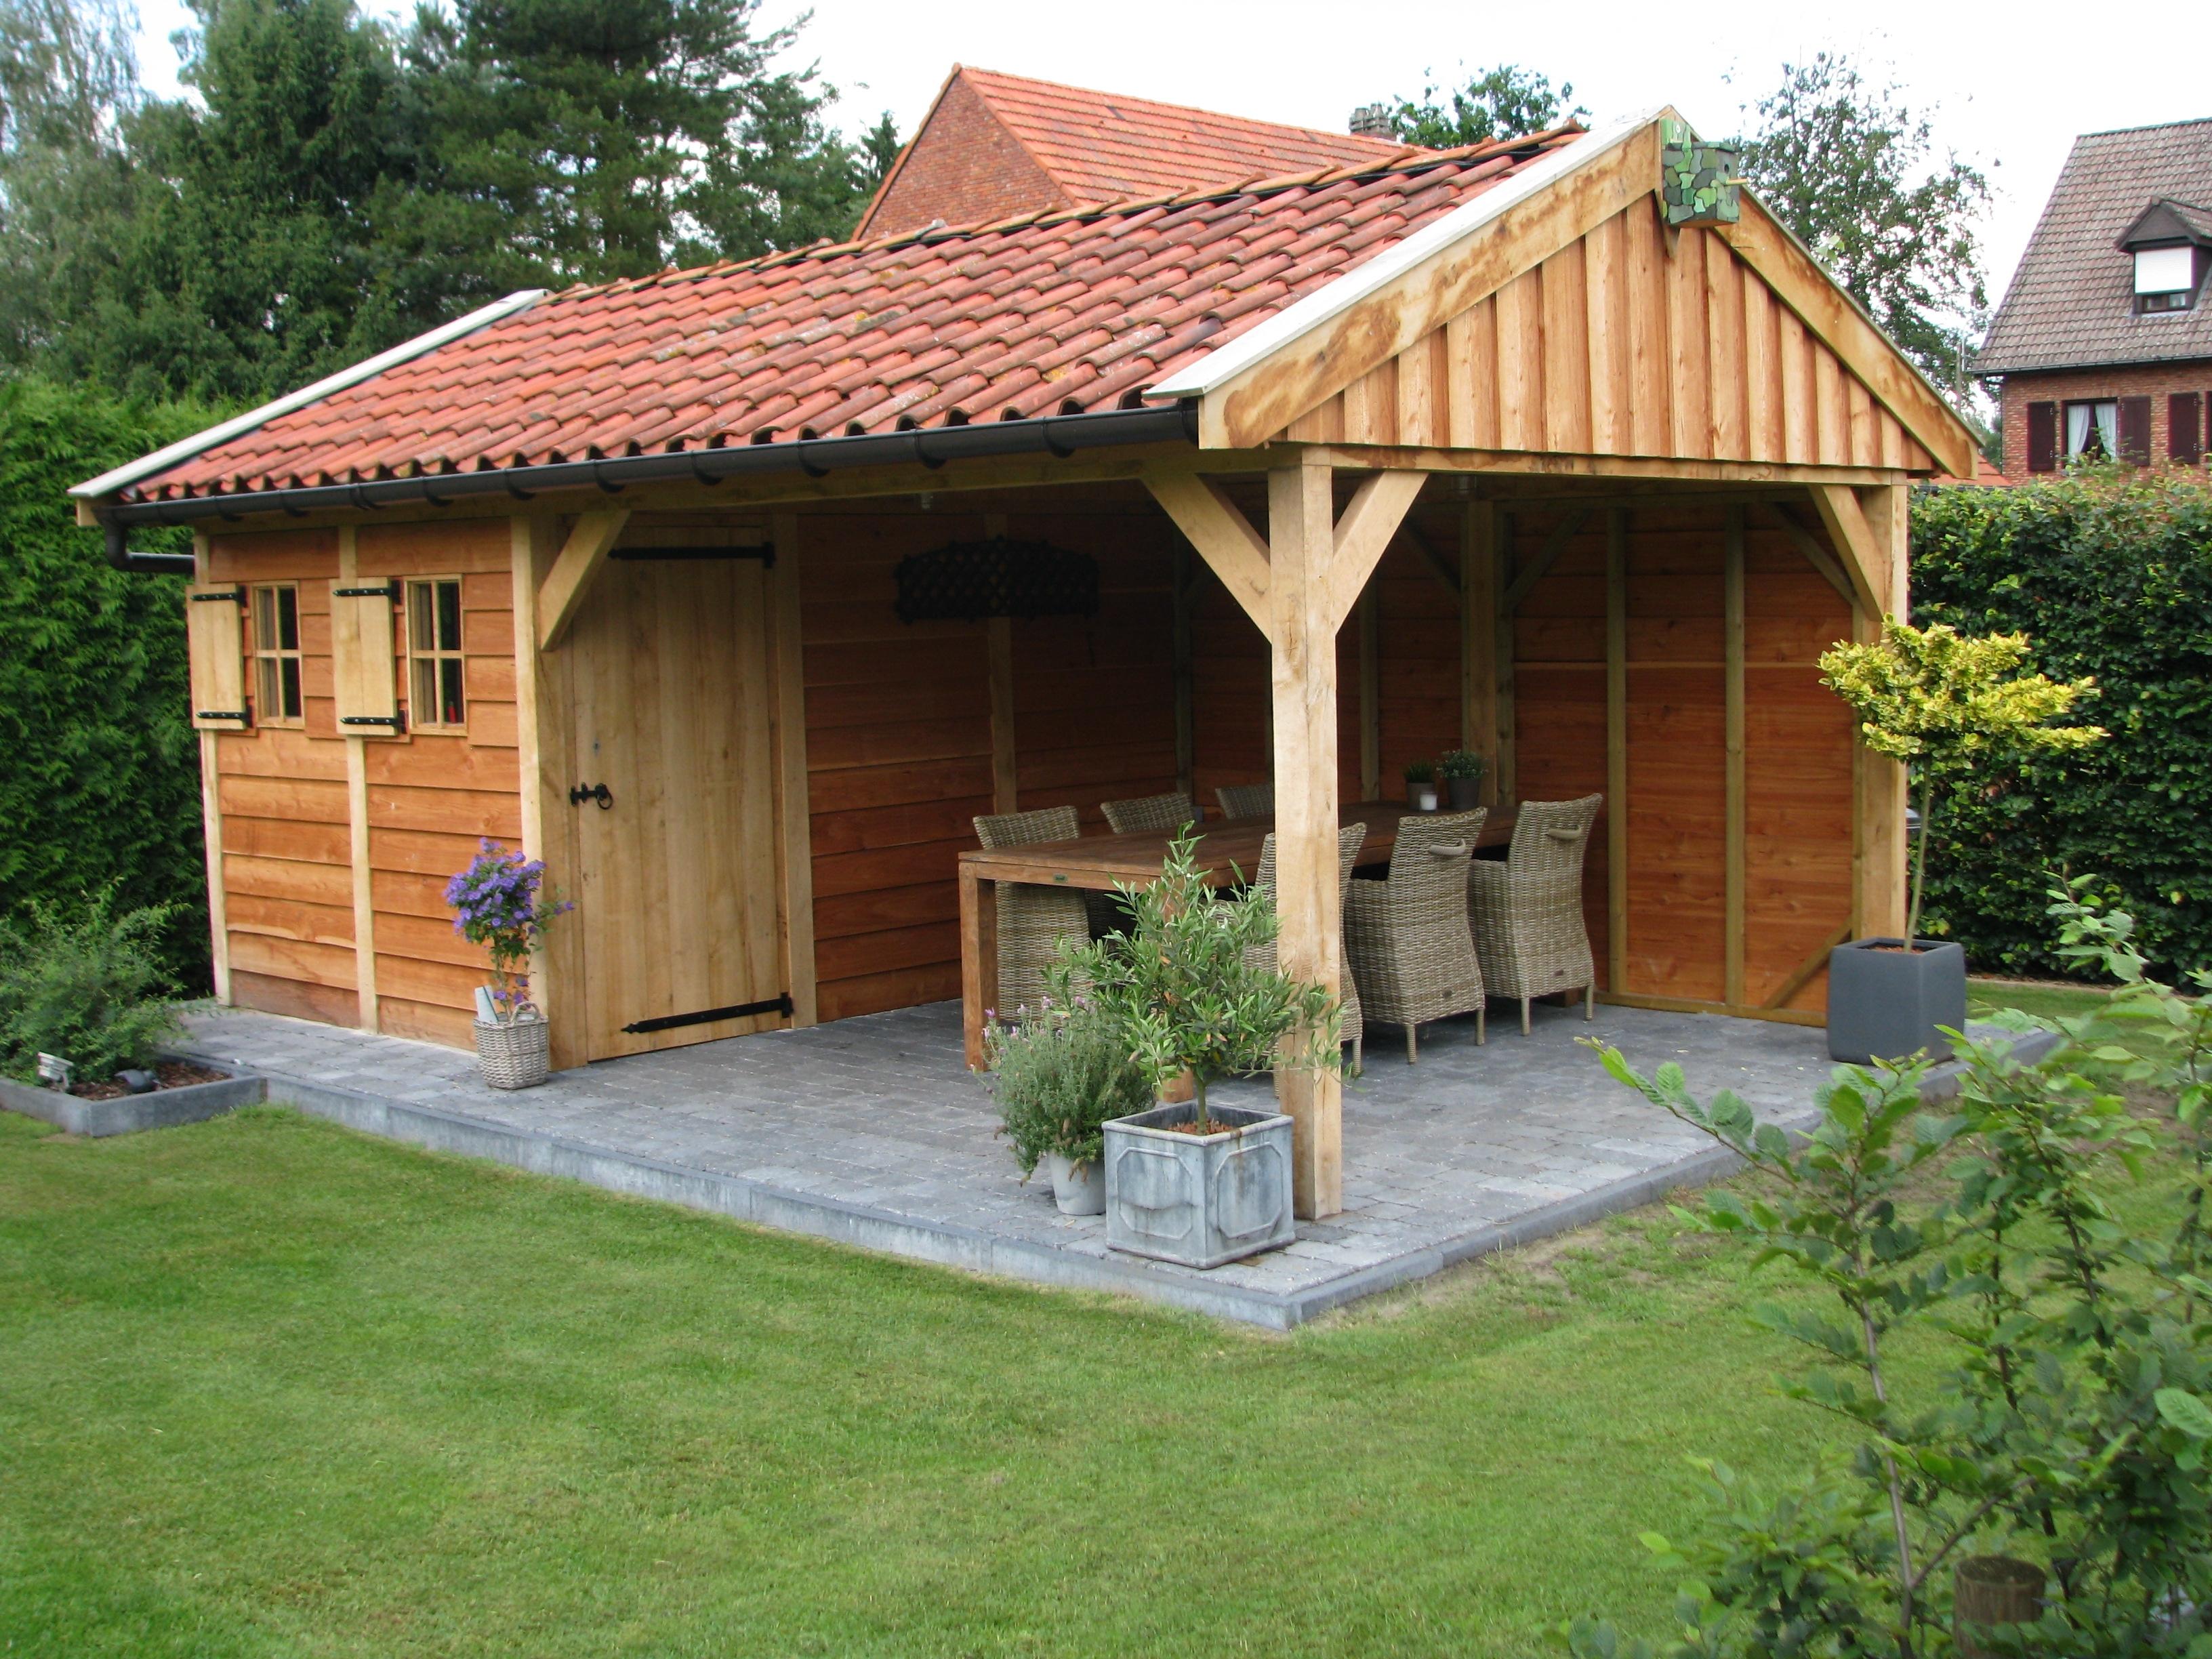 houten_tuinhuis_belgie_3 - Foto's van gerealiseerde tuinhuis met veranda in België.